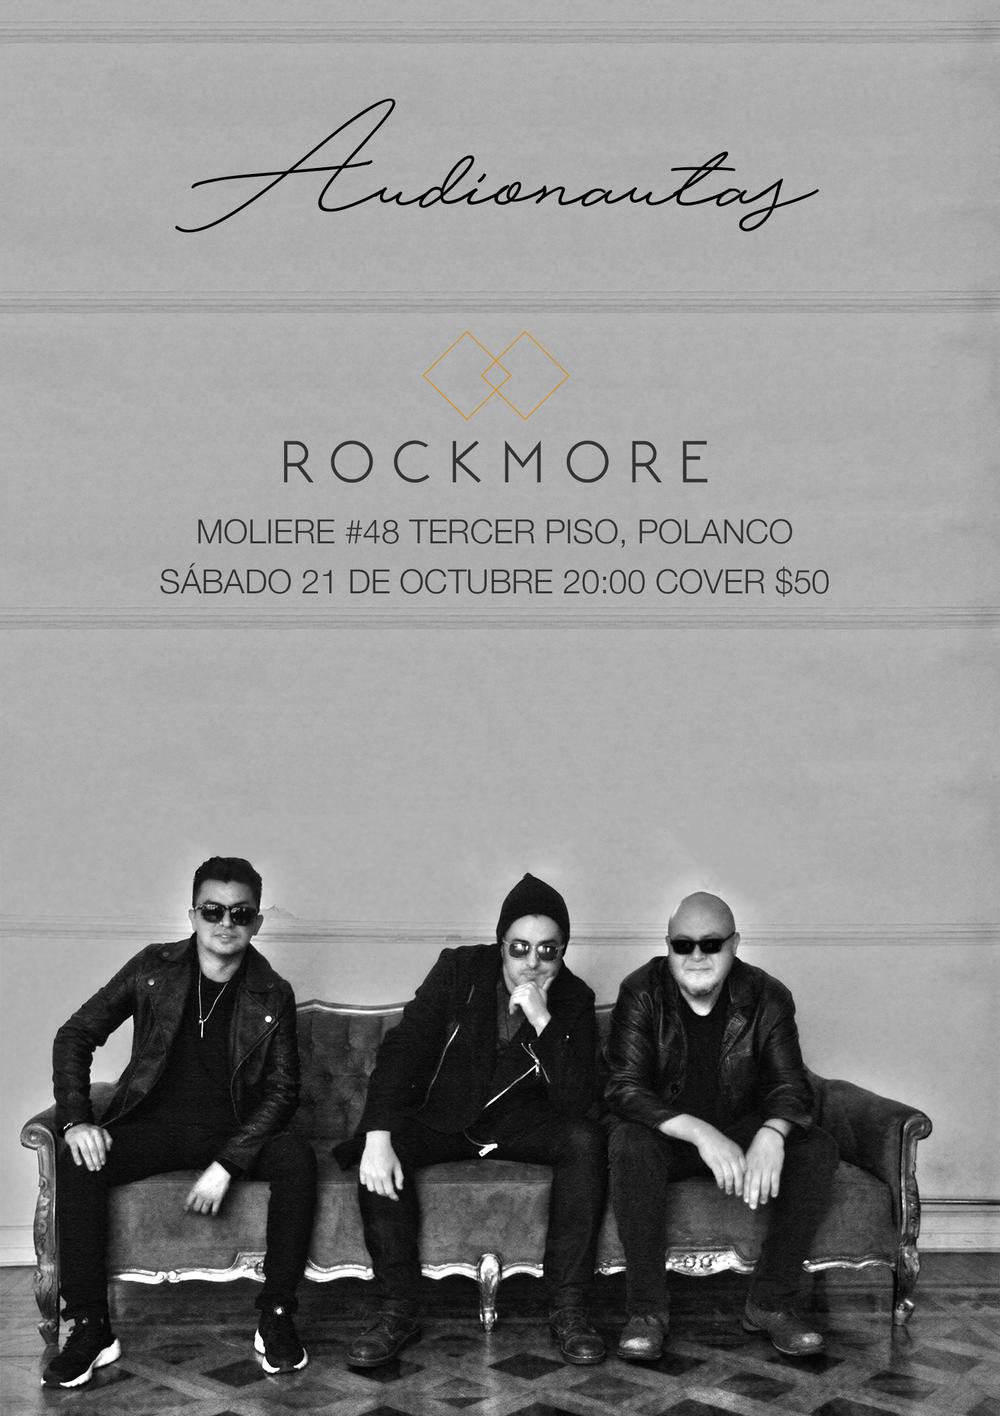 Poster_Eventos_Rockmore_Audionautas.png